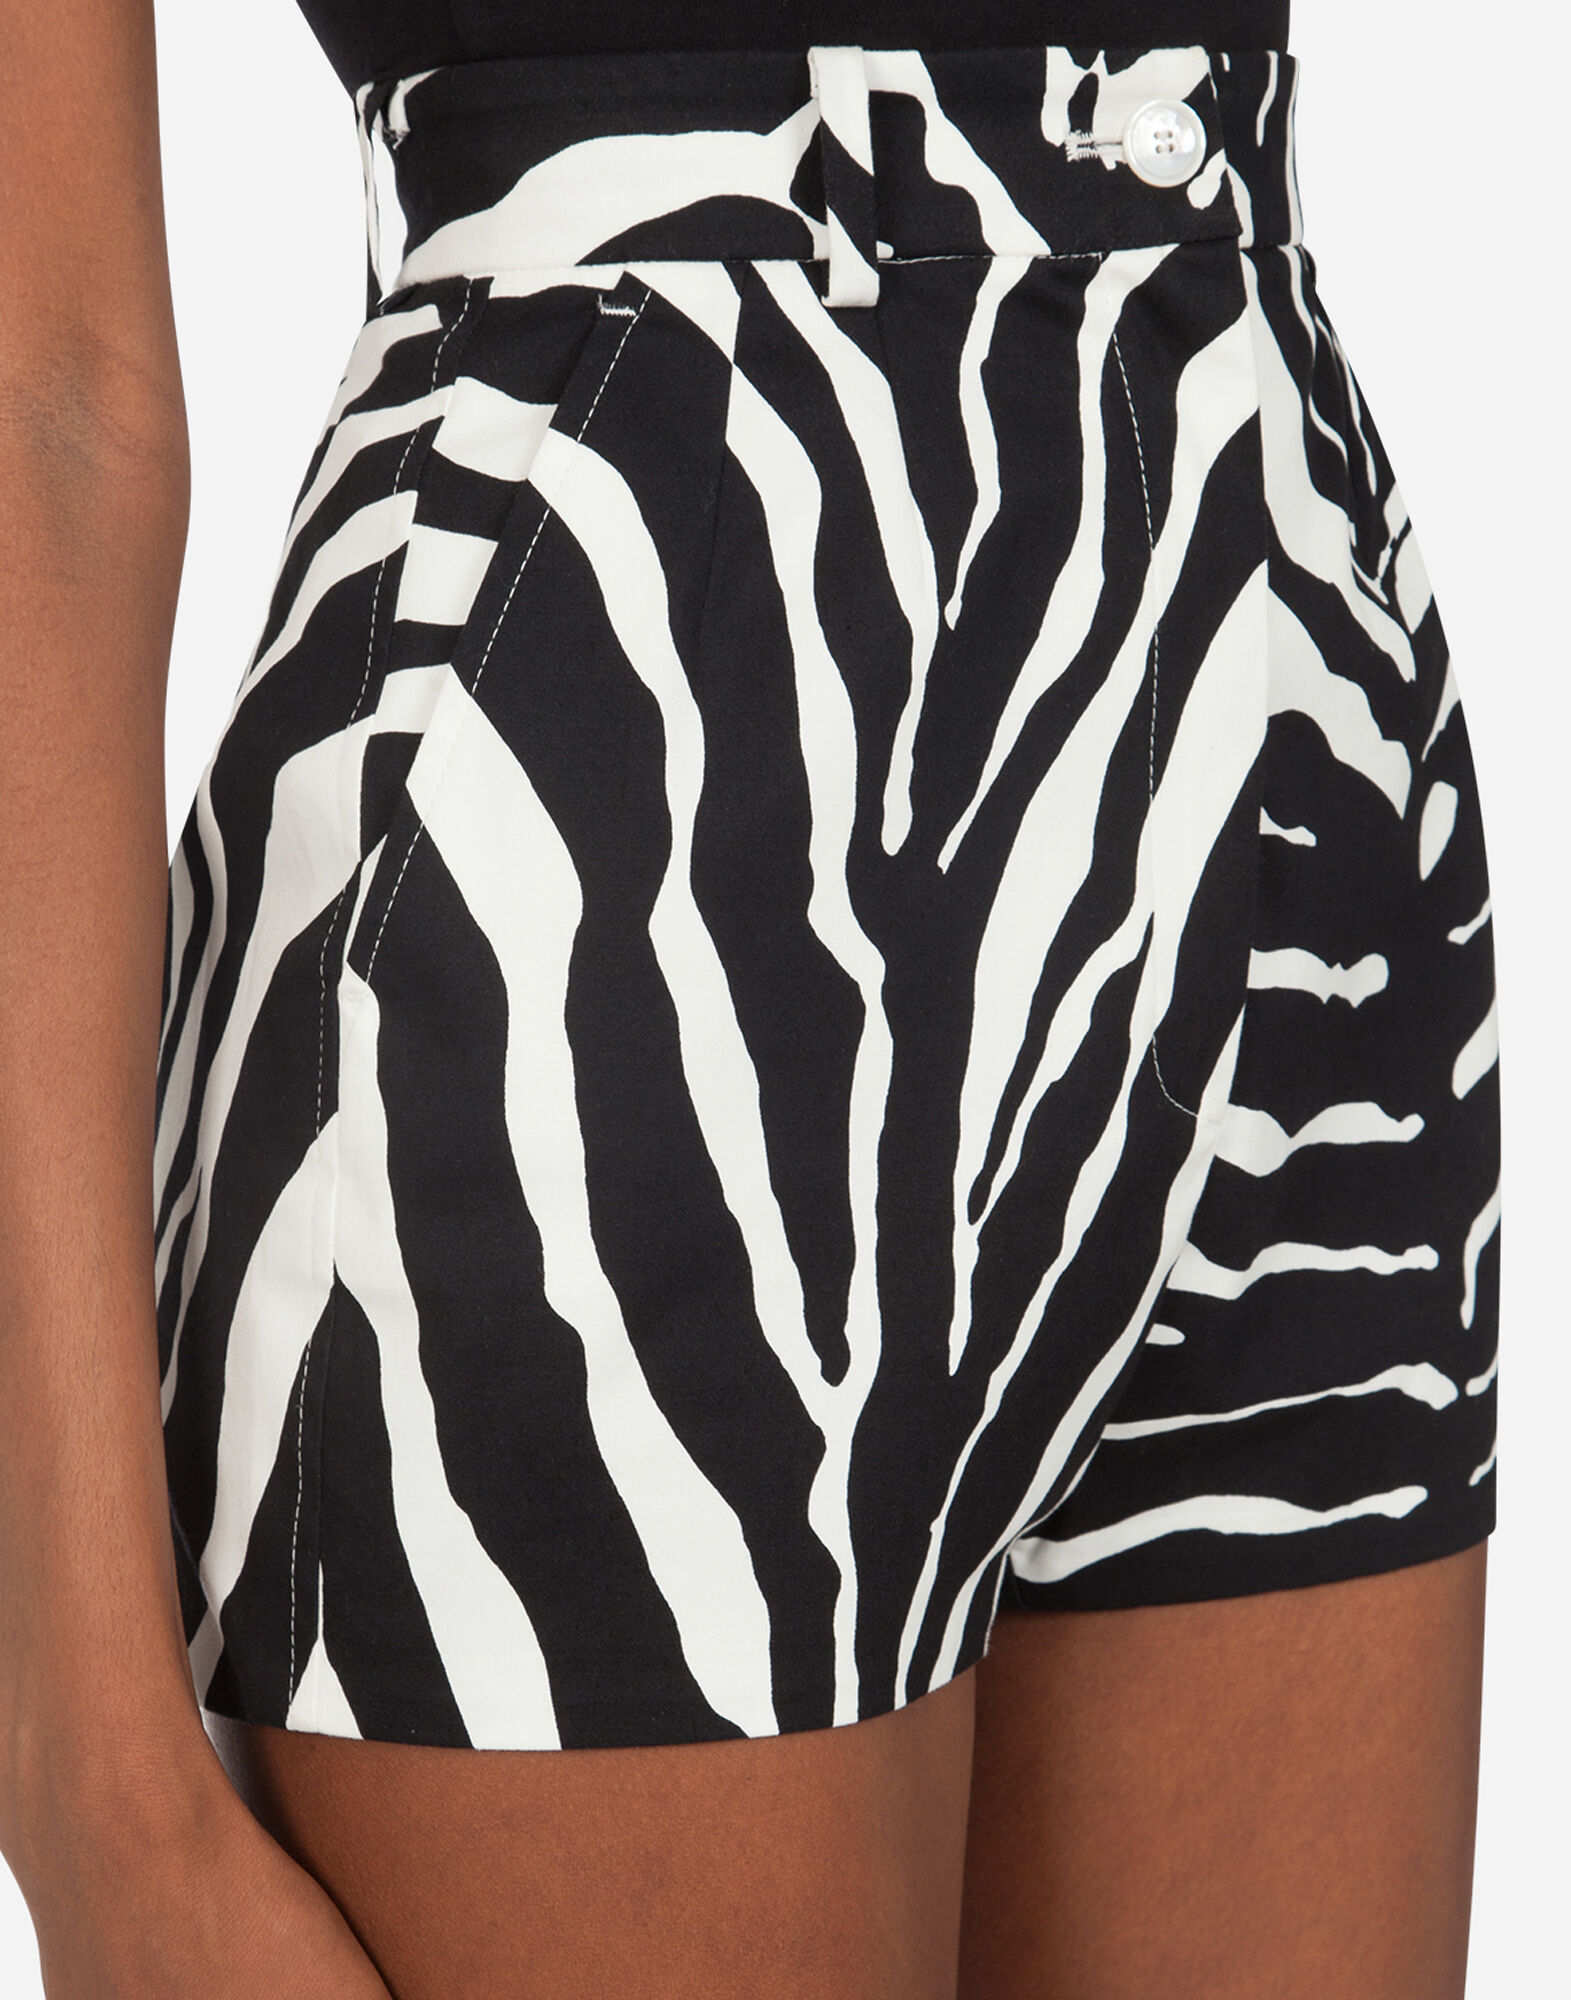 Pantalons et Shorts Femme | Dolce\u0026Gabbana